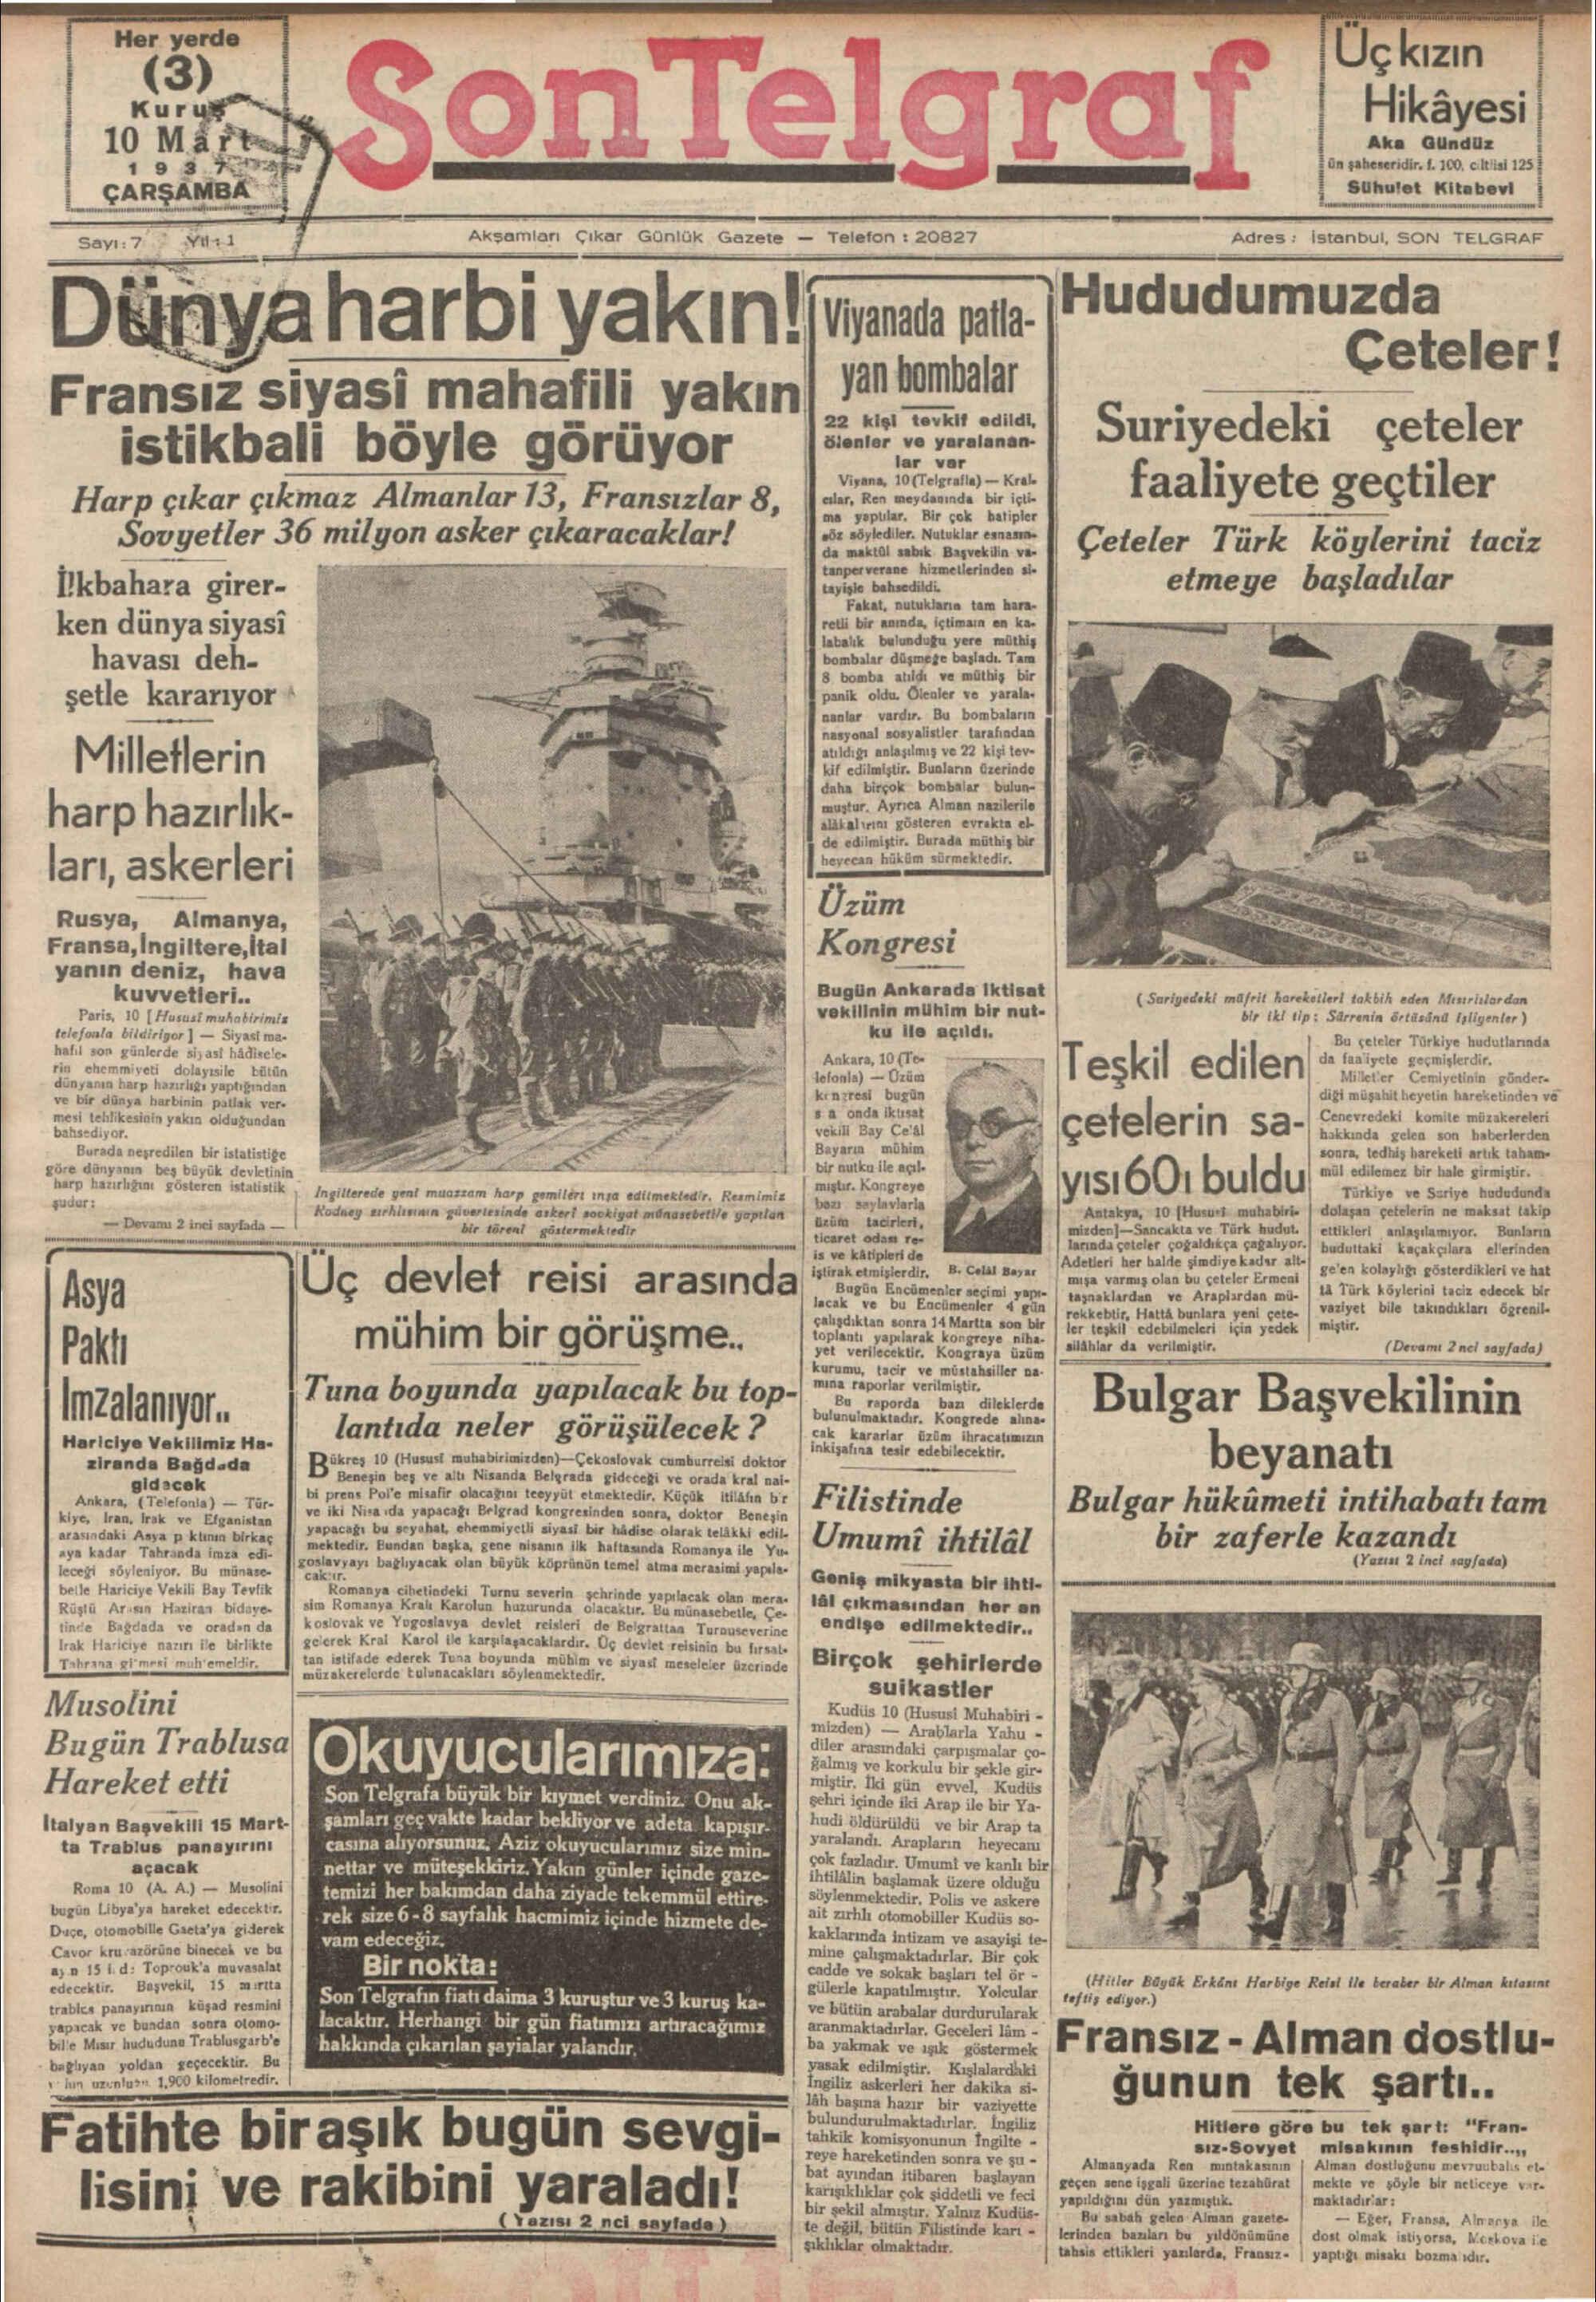 10 Mart 1937 Tarihli Son Telgraf Gazetesi Sayfa 1